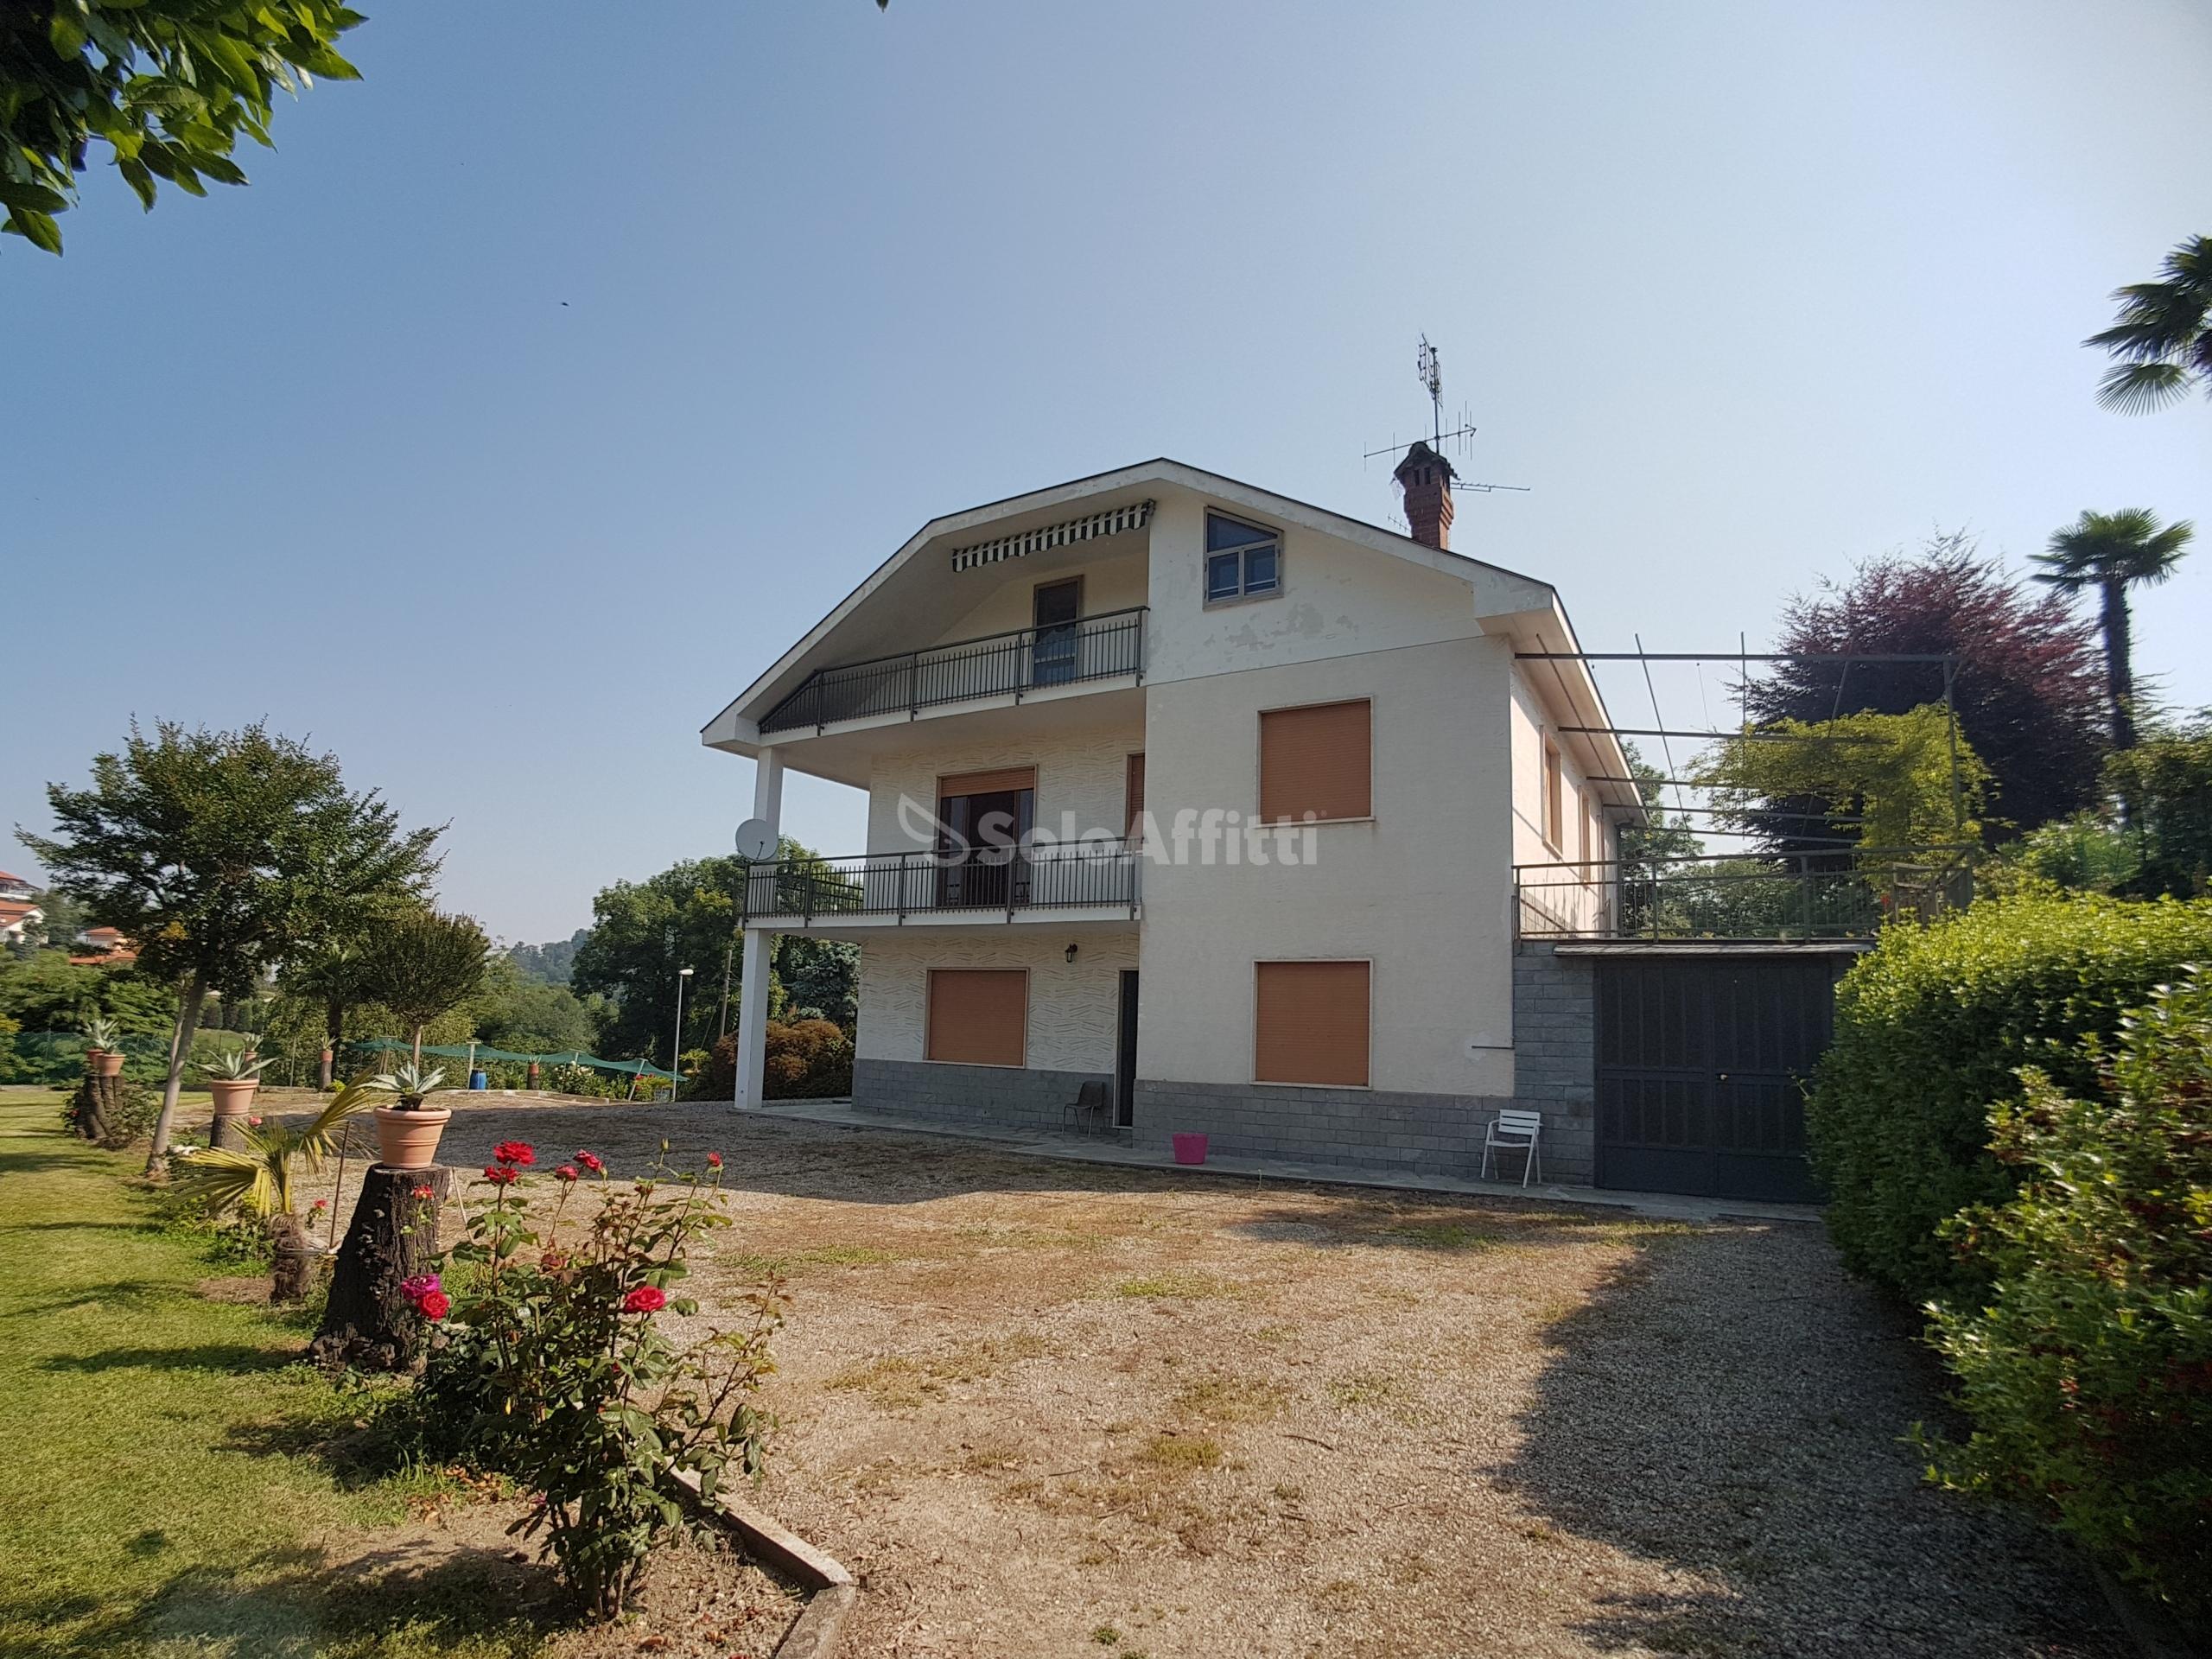 Villa Bifamiliare 9 vani